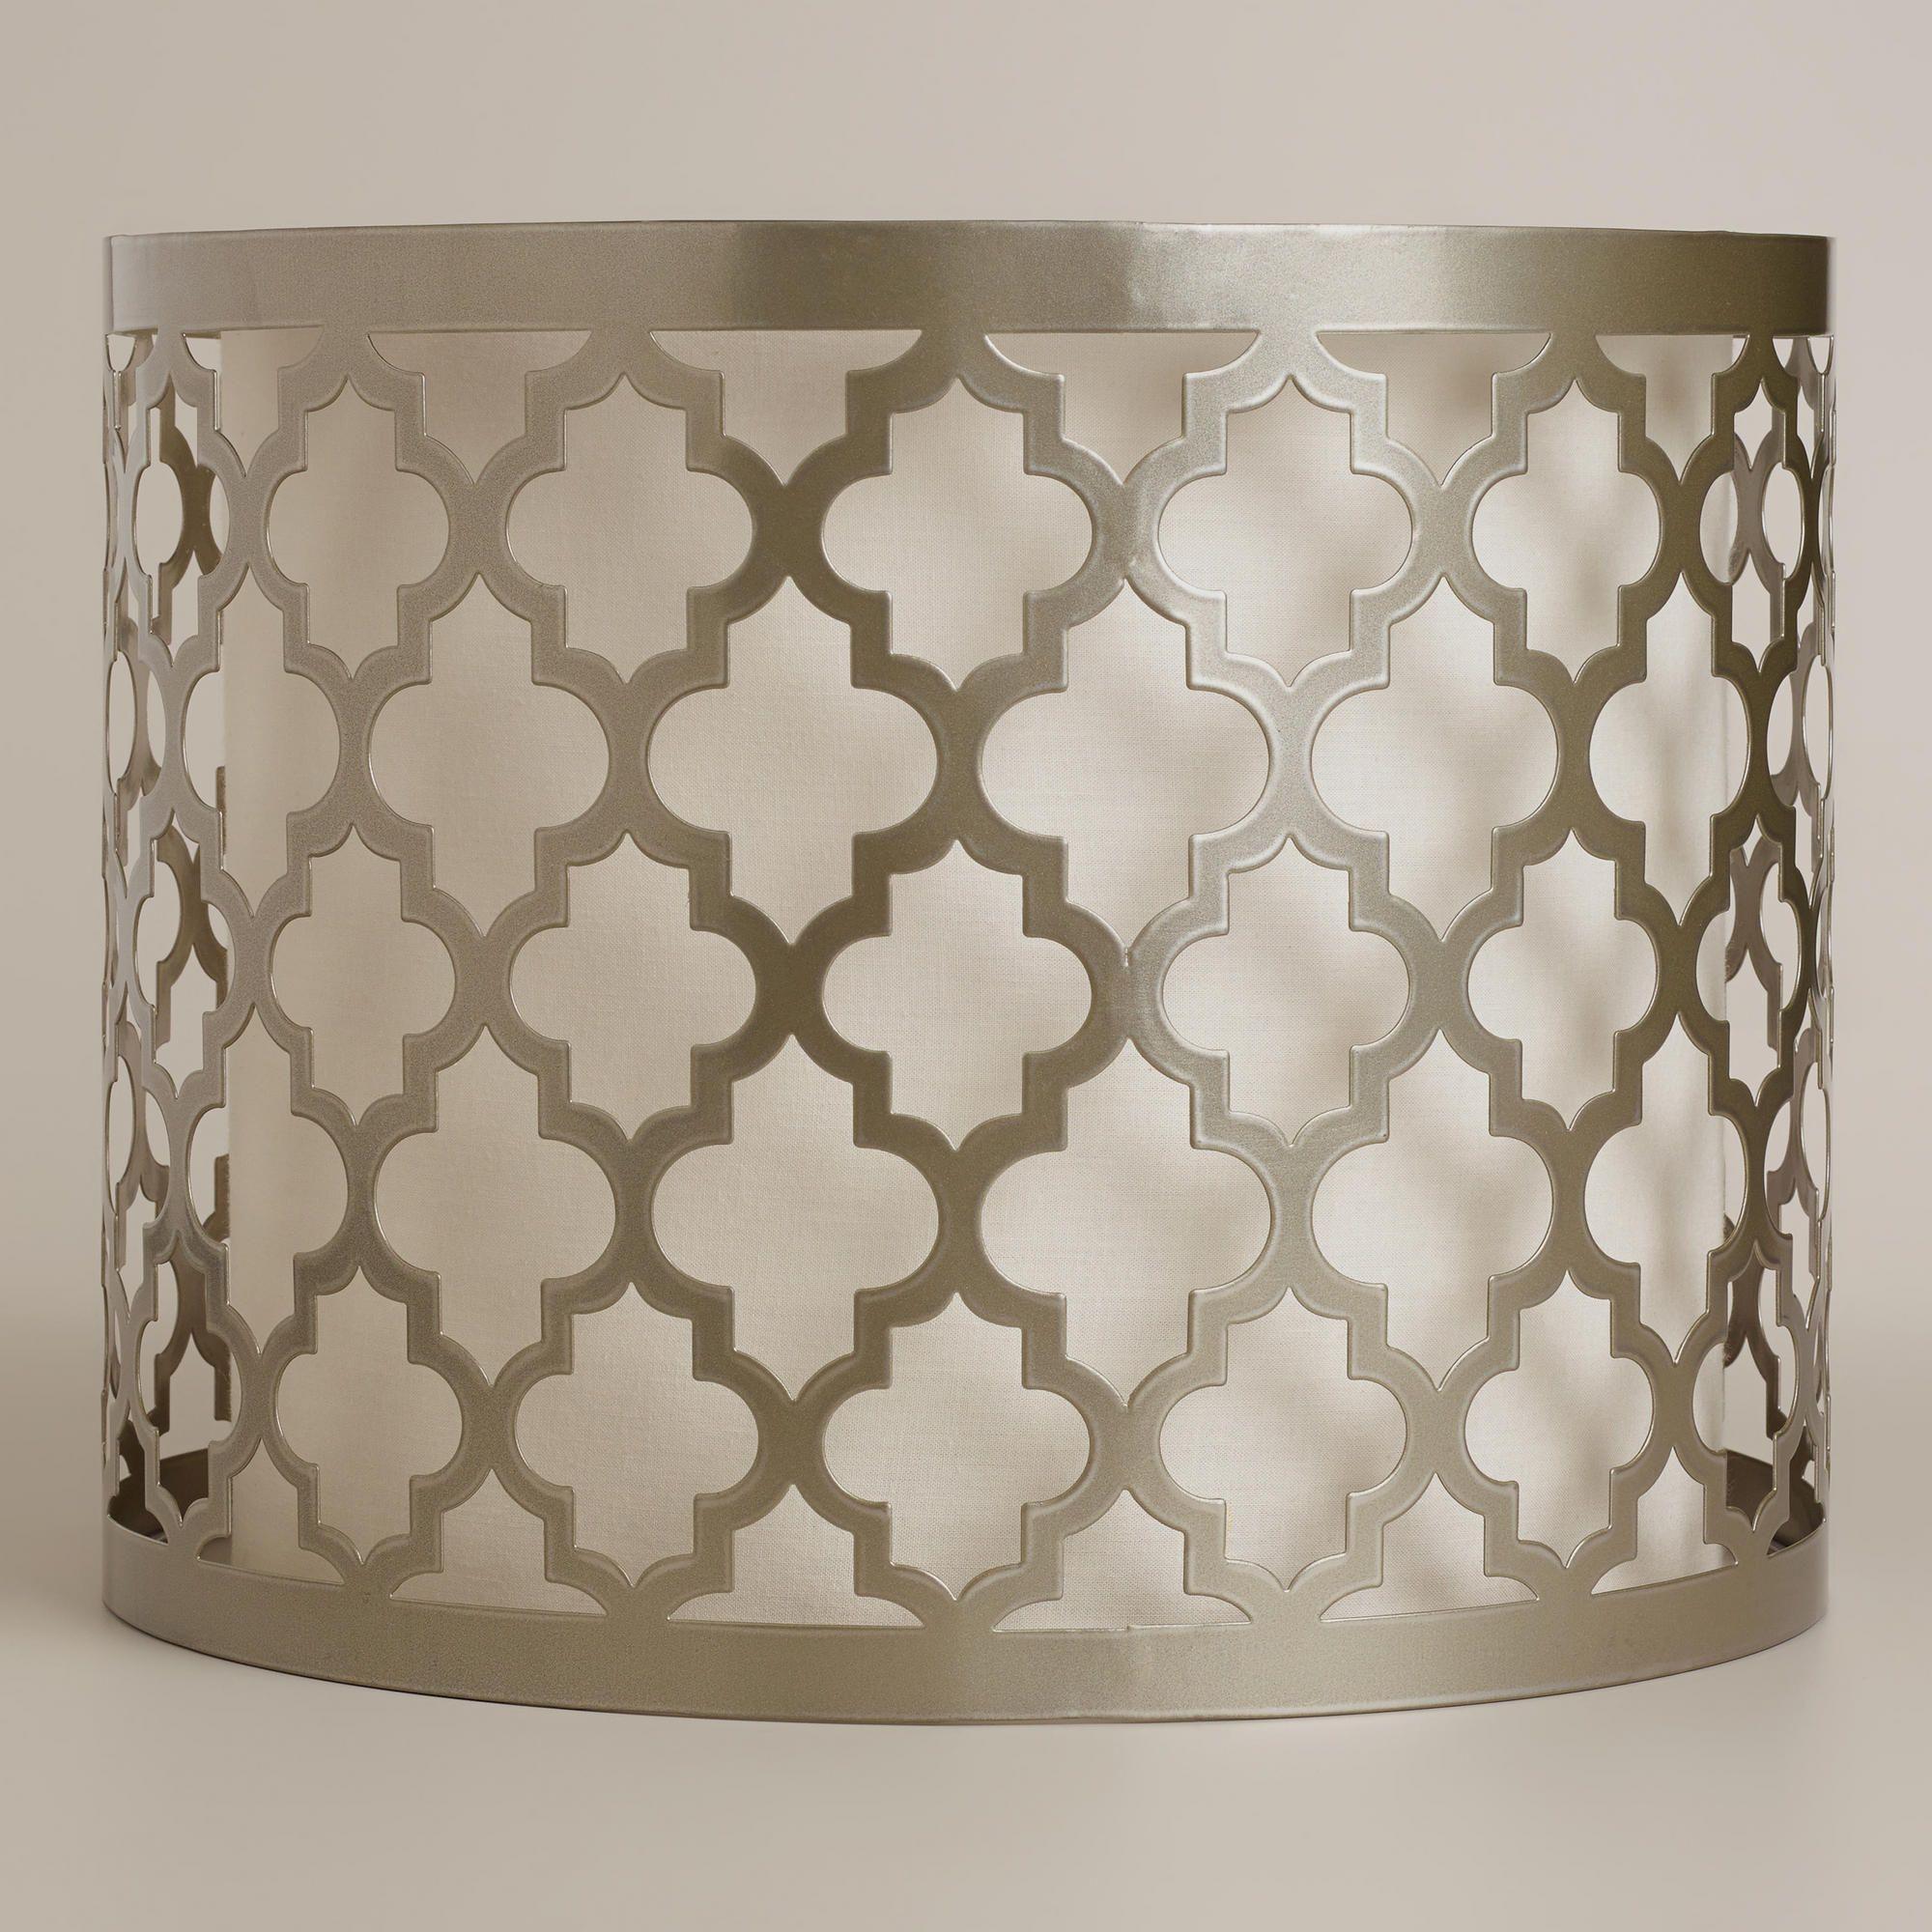 Moroccan Lattice Drum Table Lamp Shade World Market 50 00 This